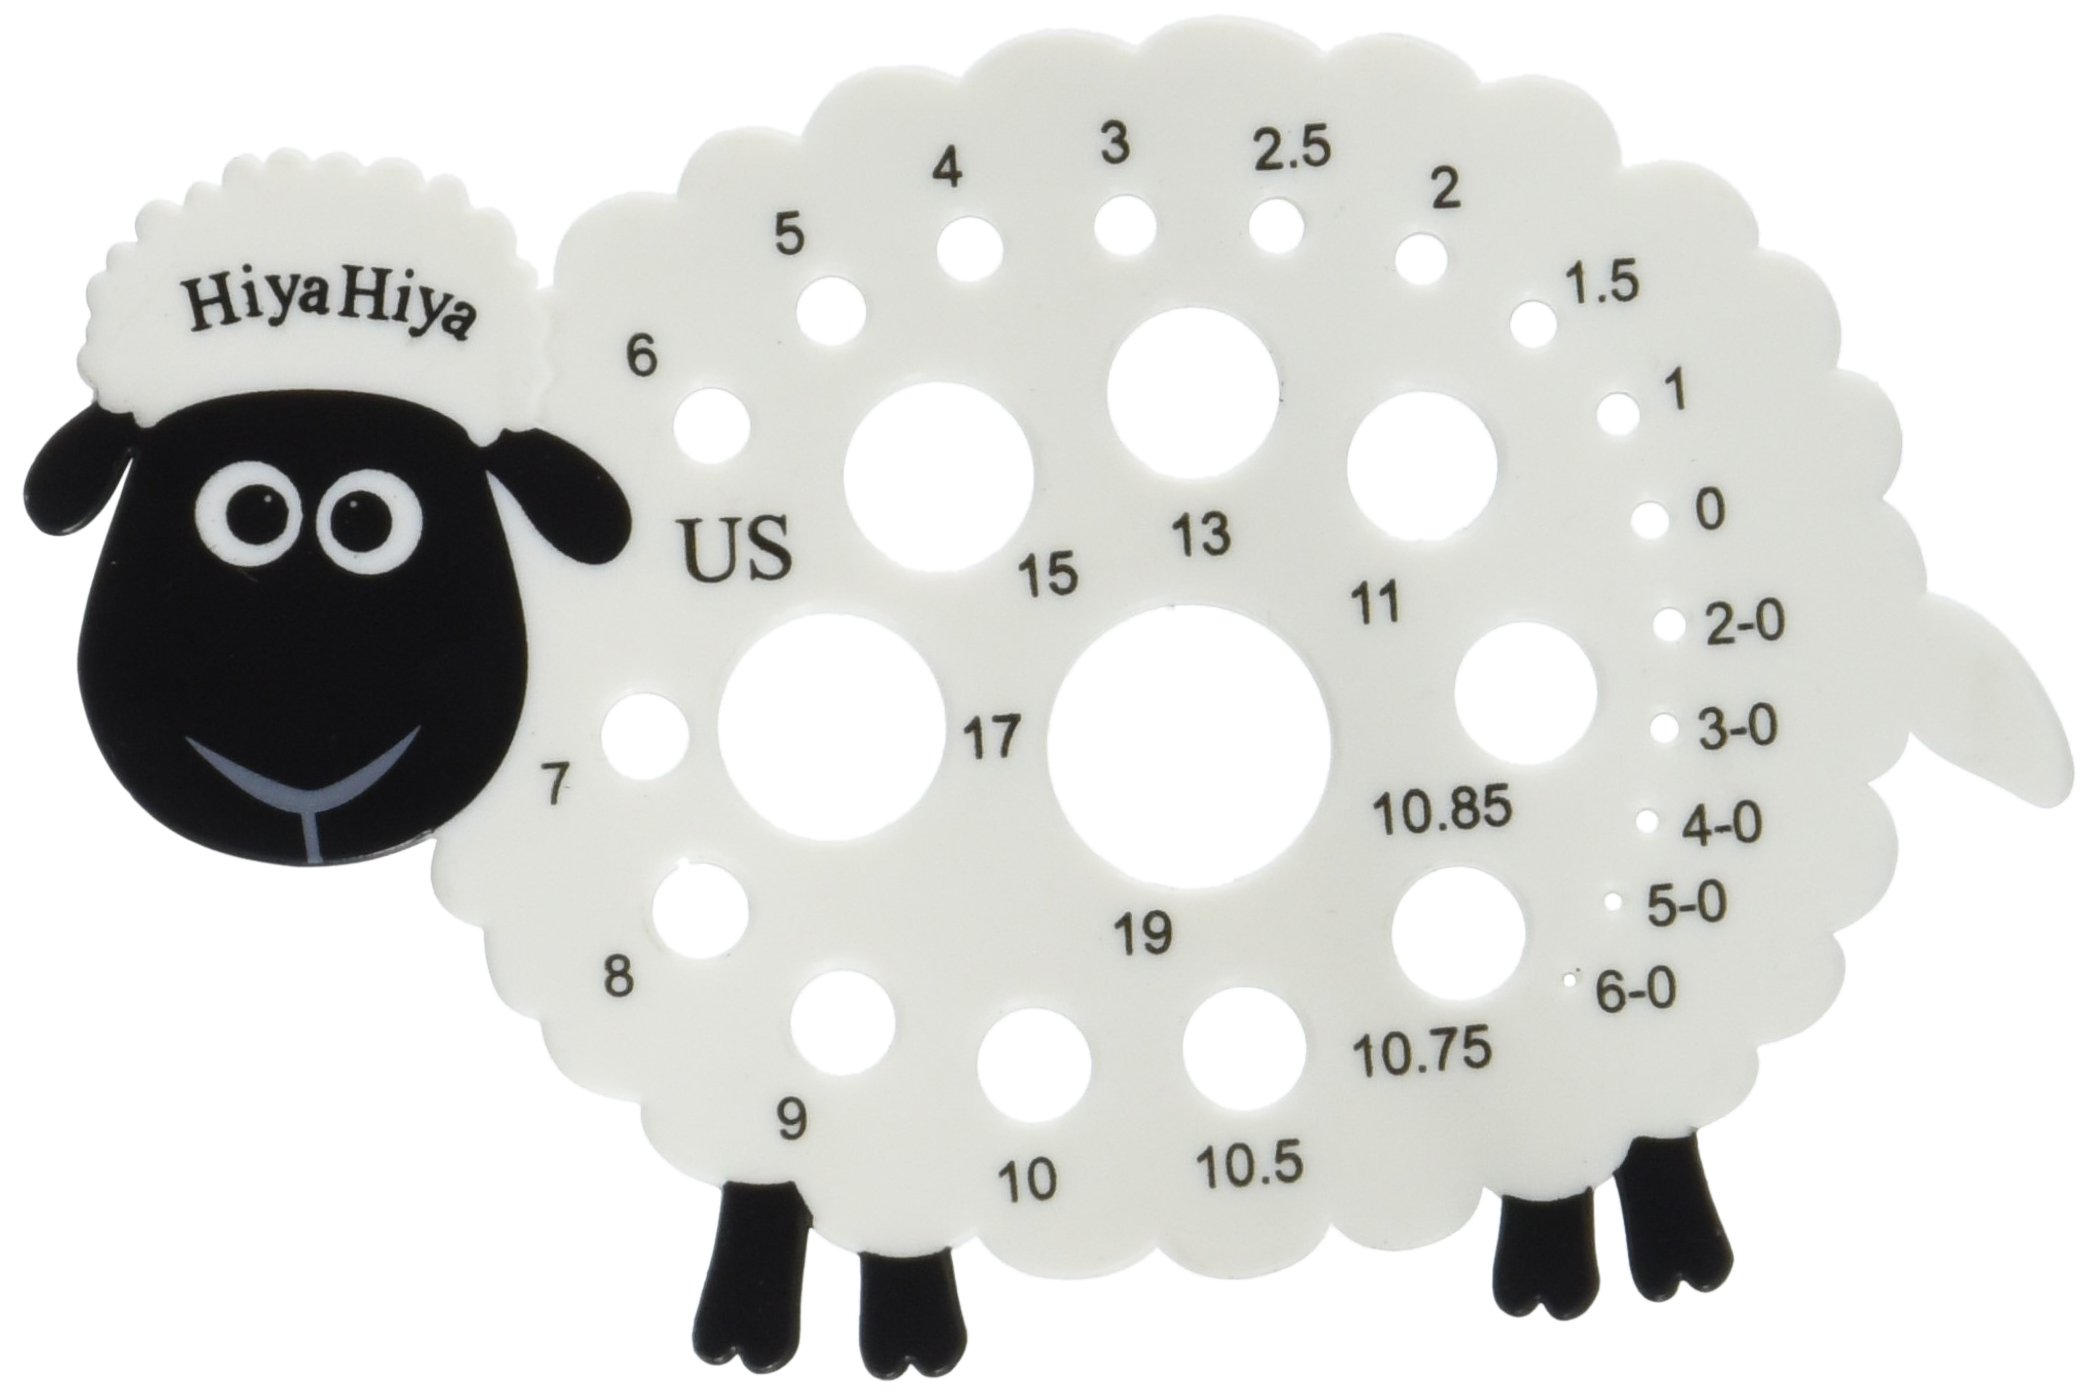 Hiyahiya - Aguja de tejer calibre de ovejas